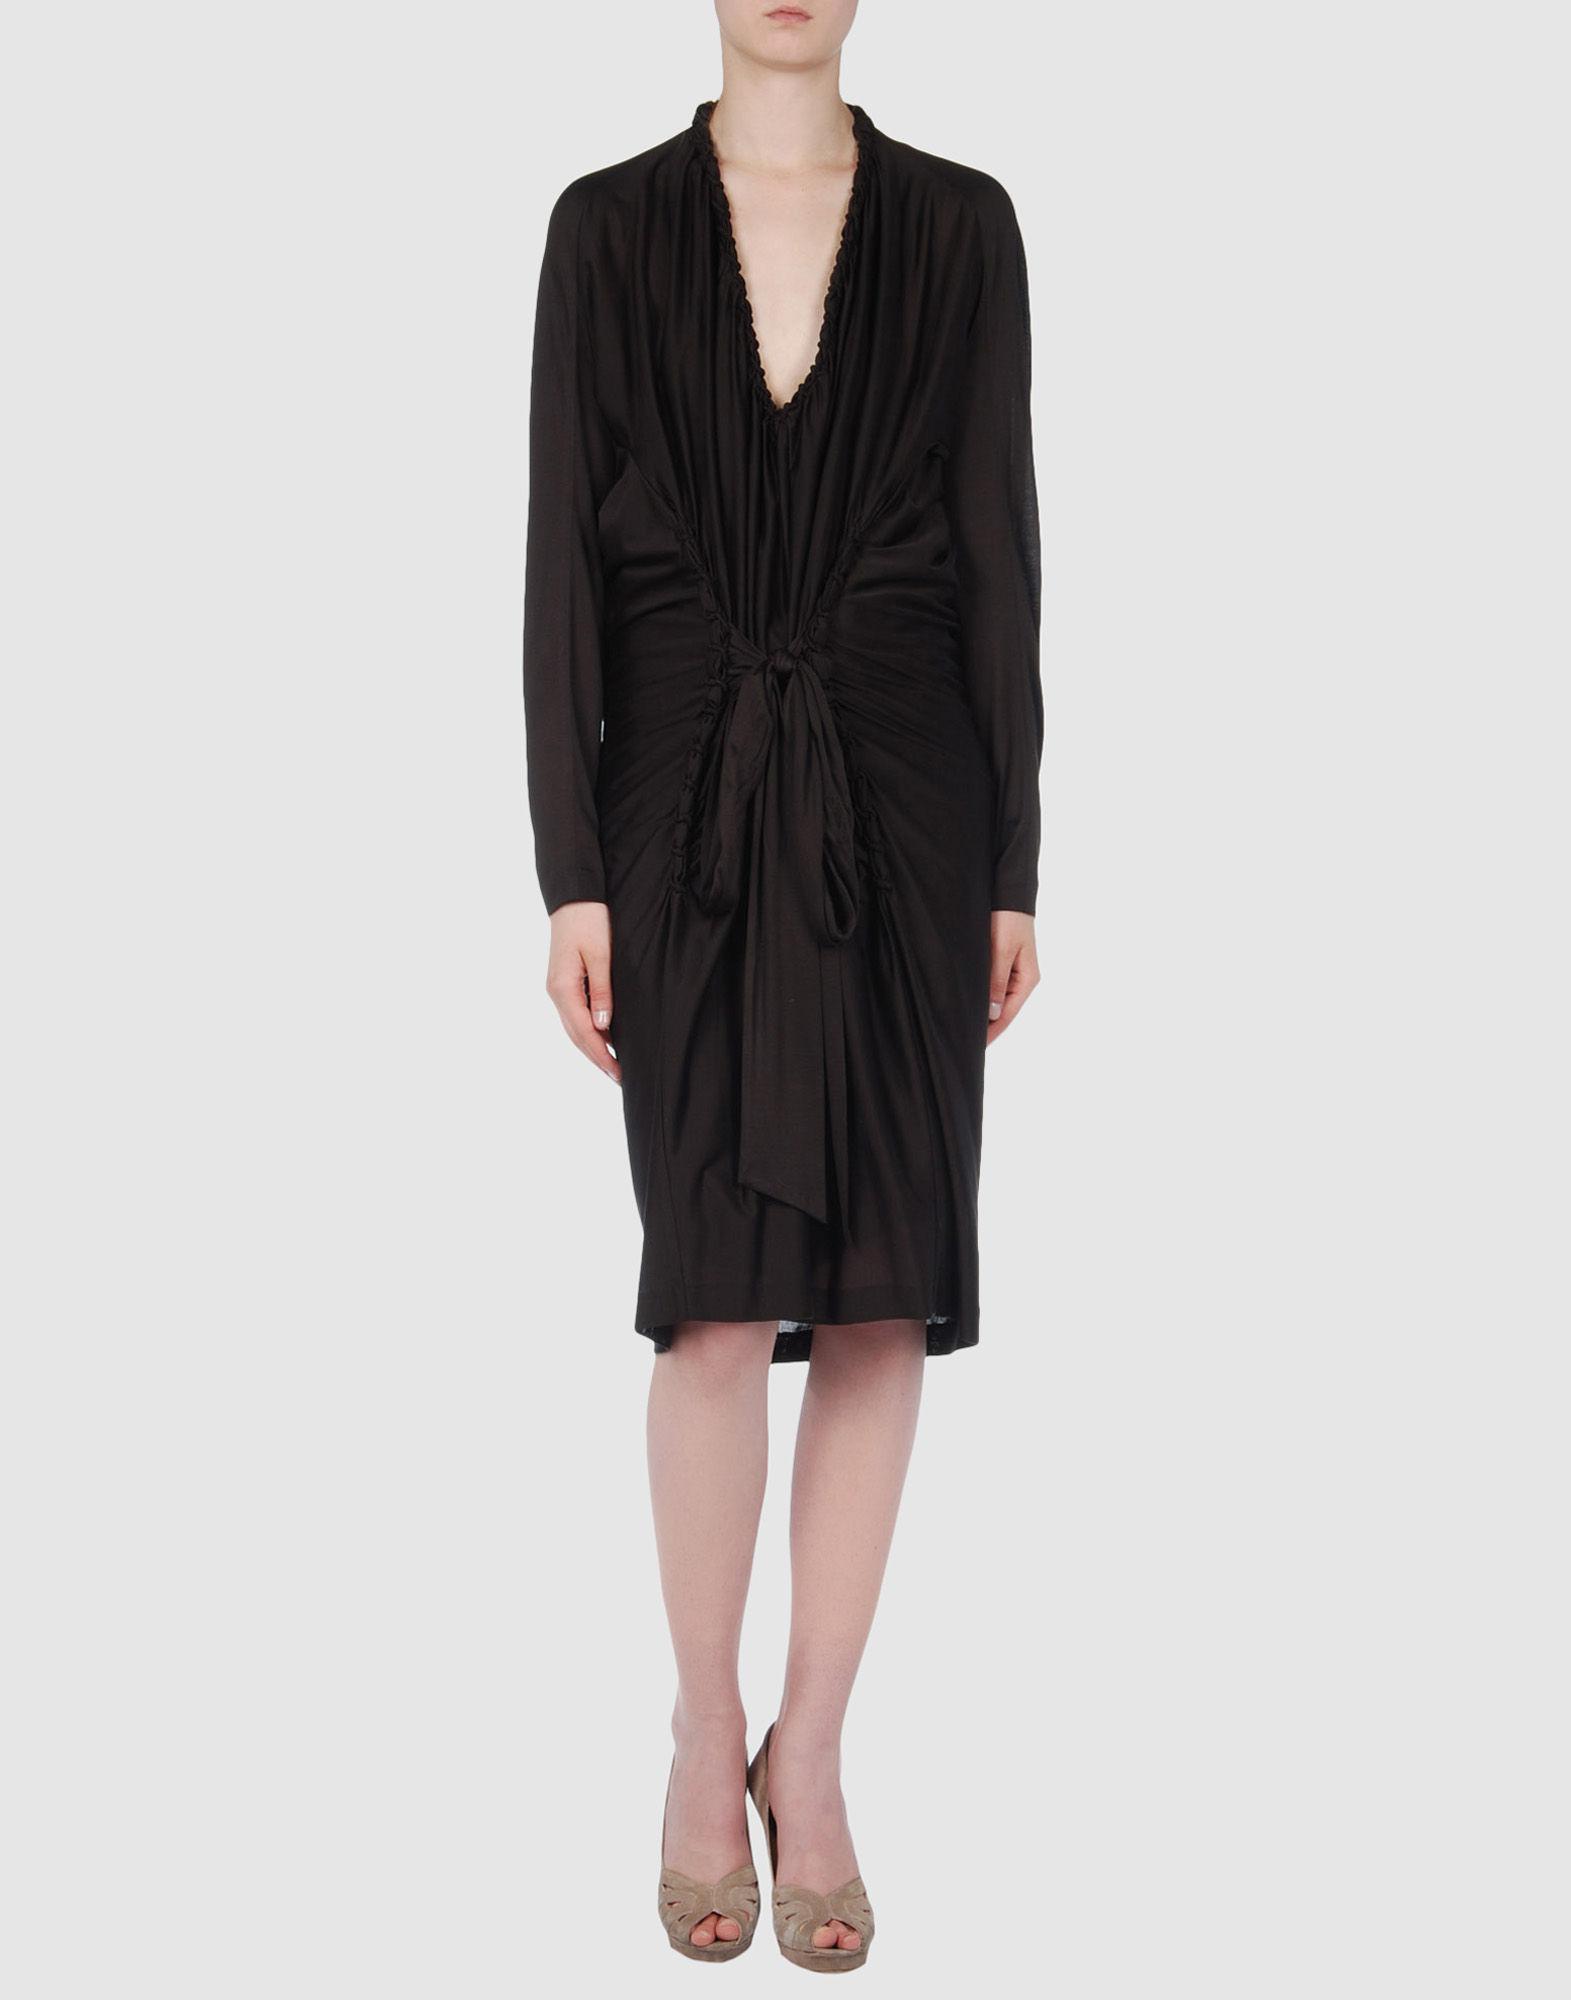 34220338CB 14 f - Βραδυνα Φορεματα Yves Saint Laurent Rive Gauche Κωδ.29